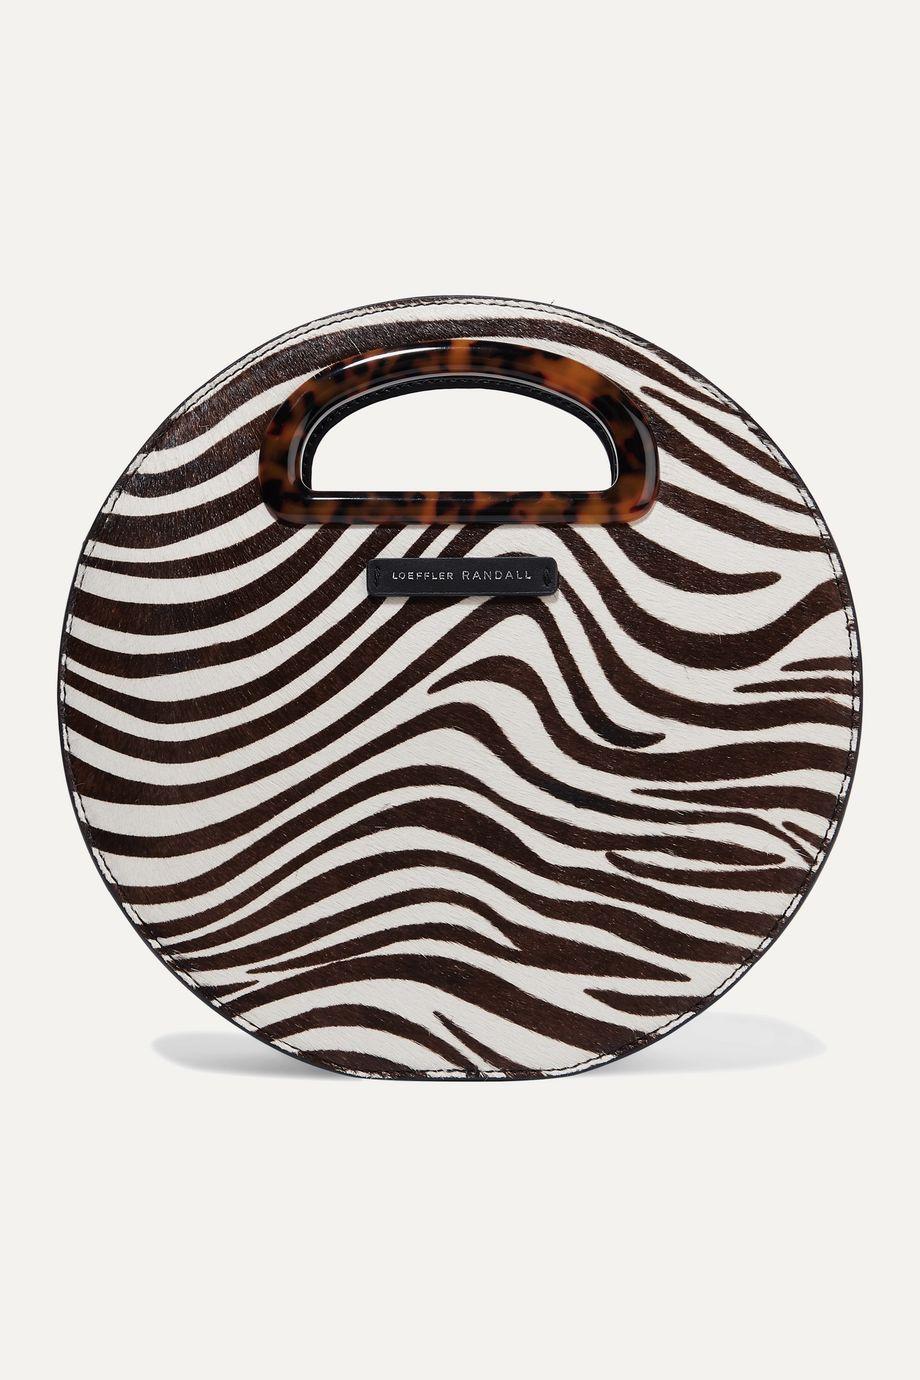 Loeffler Randall Indy zebra-print calf hair shoulder bag